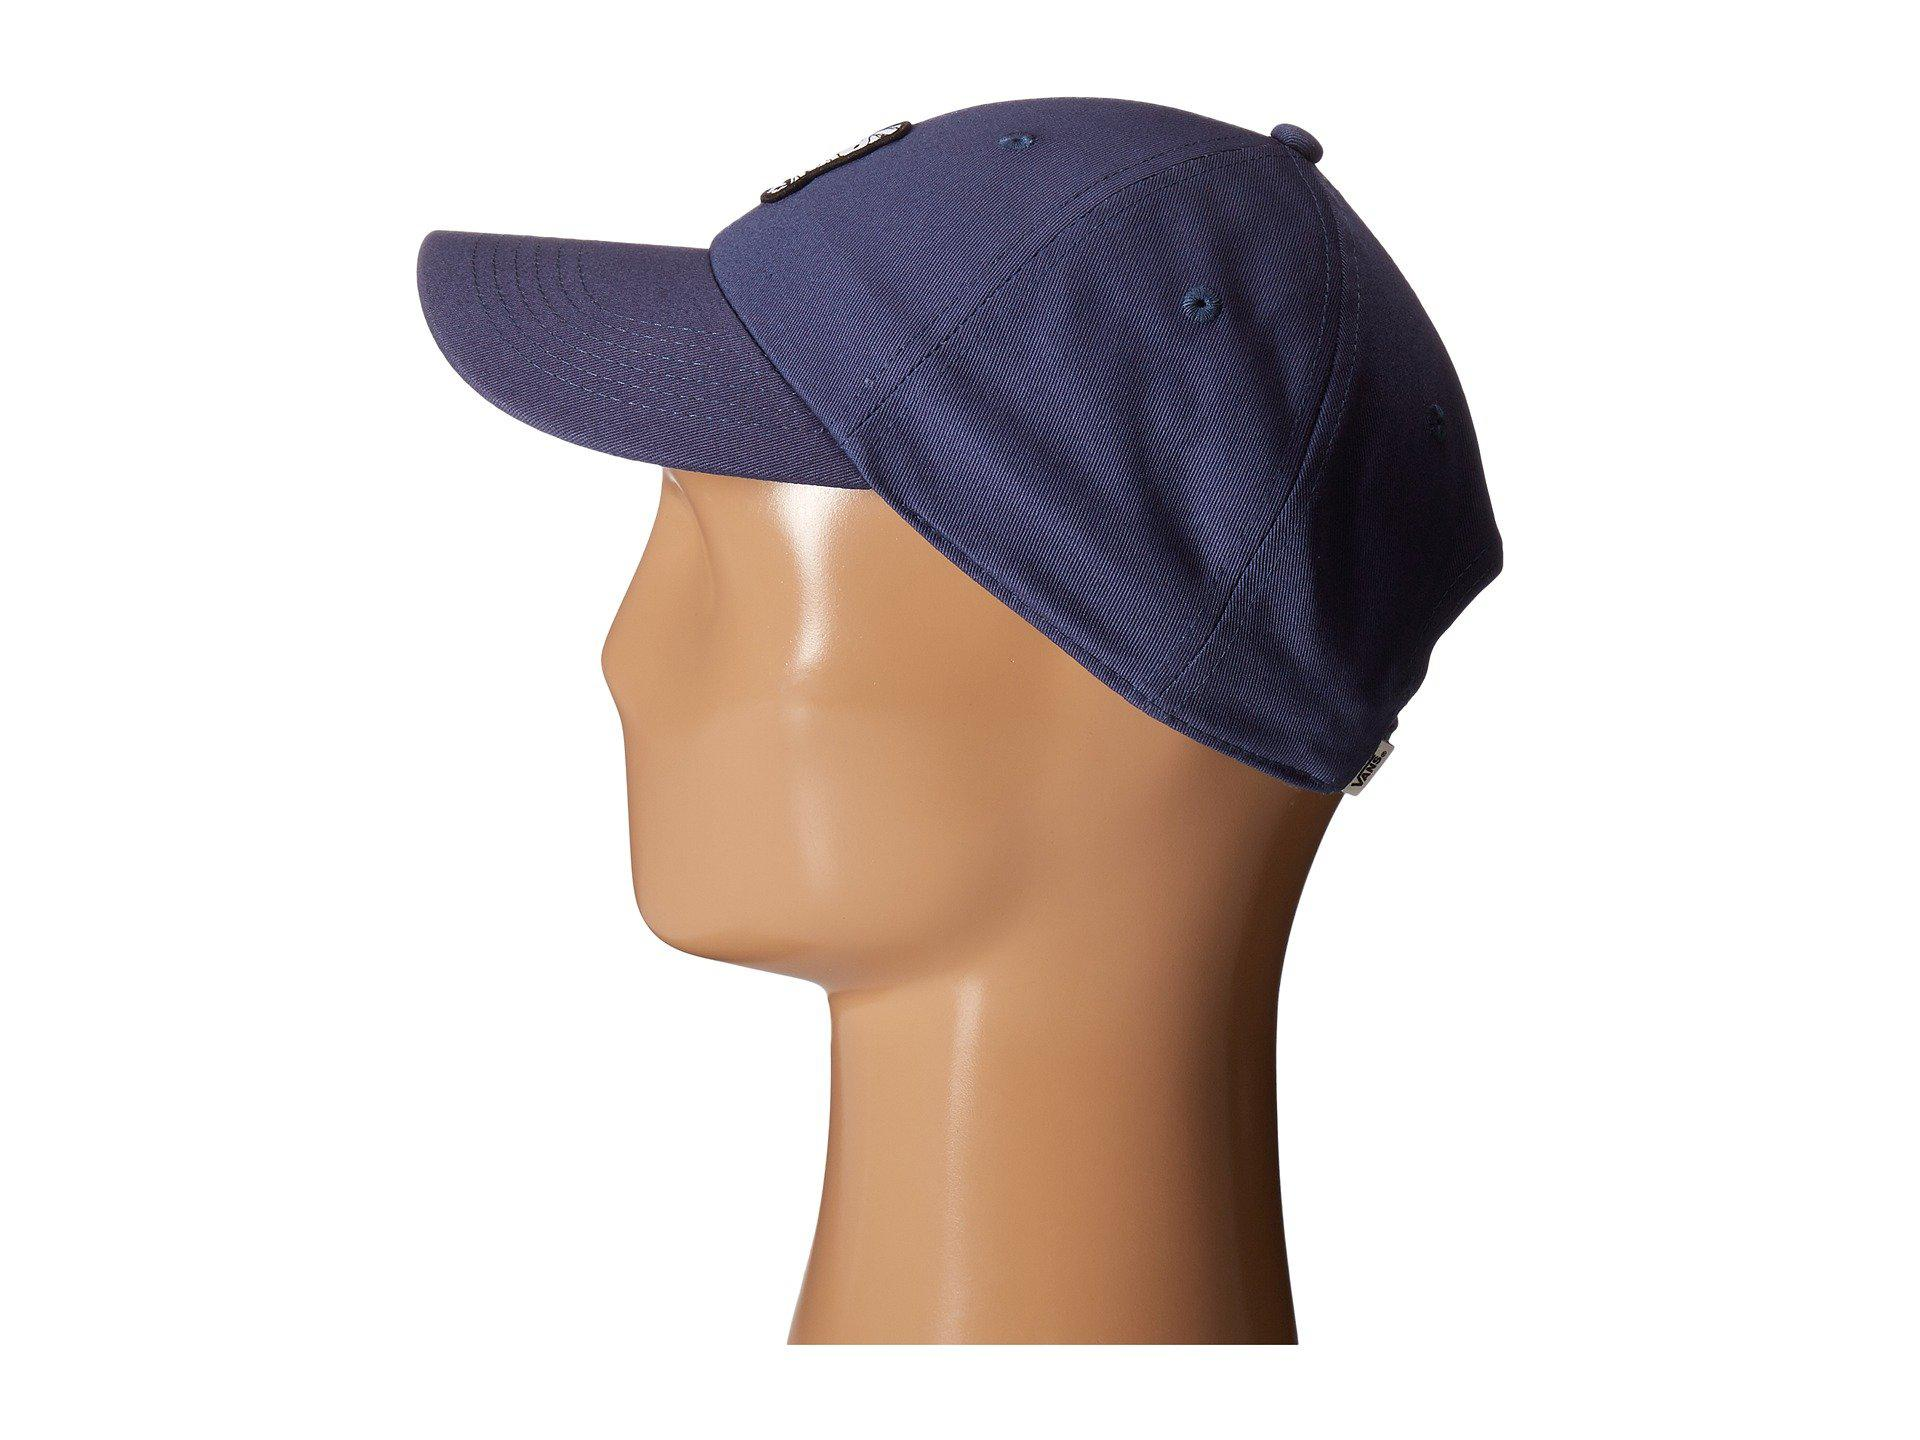 d33548ba273 Lyst - Vans Peanuts Court Side Hat in Blue for Men